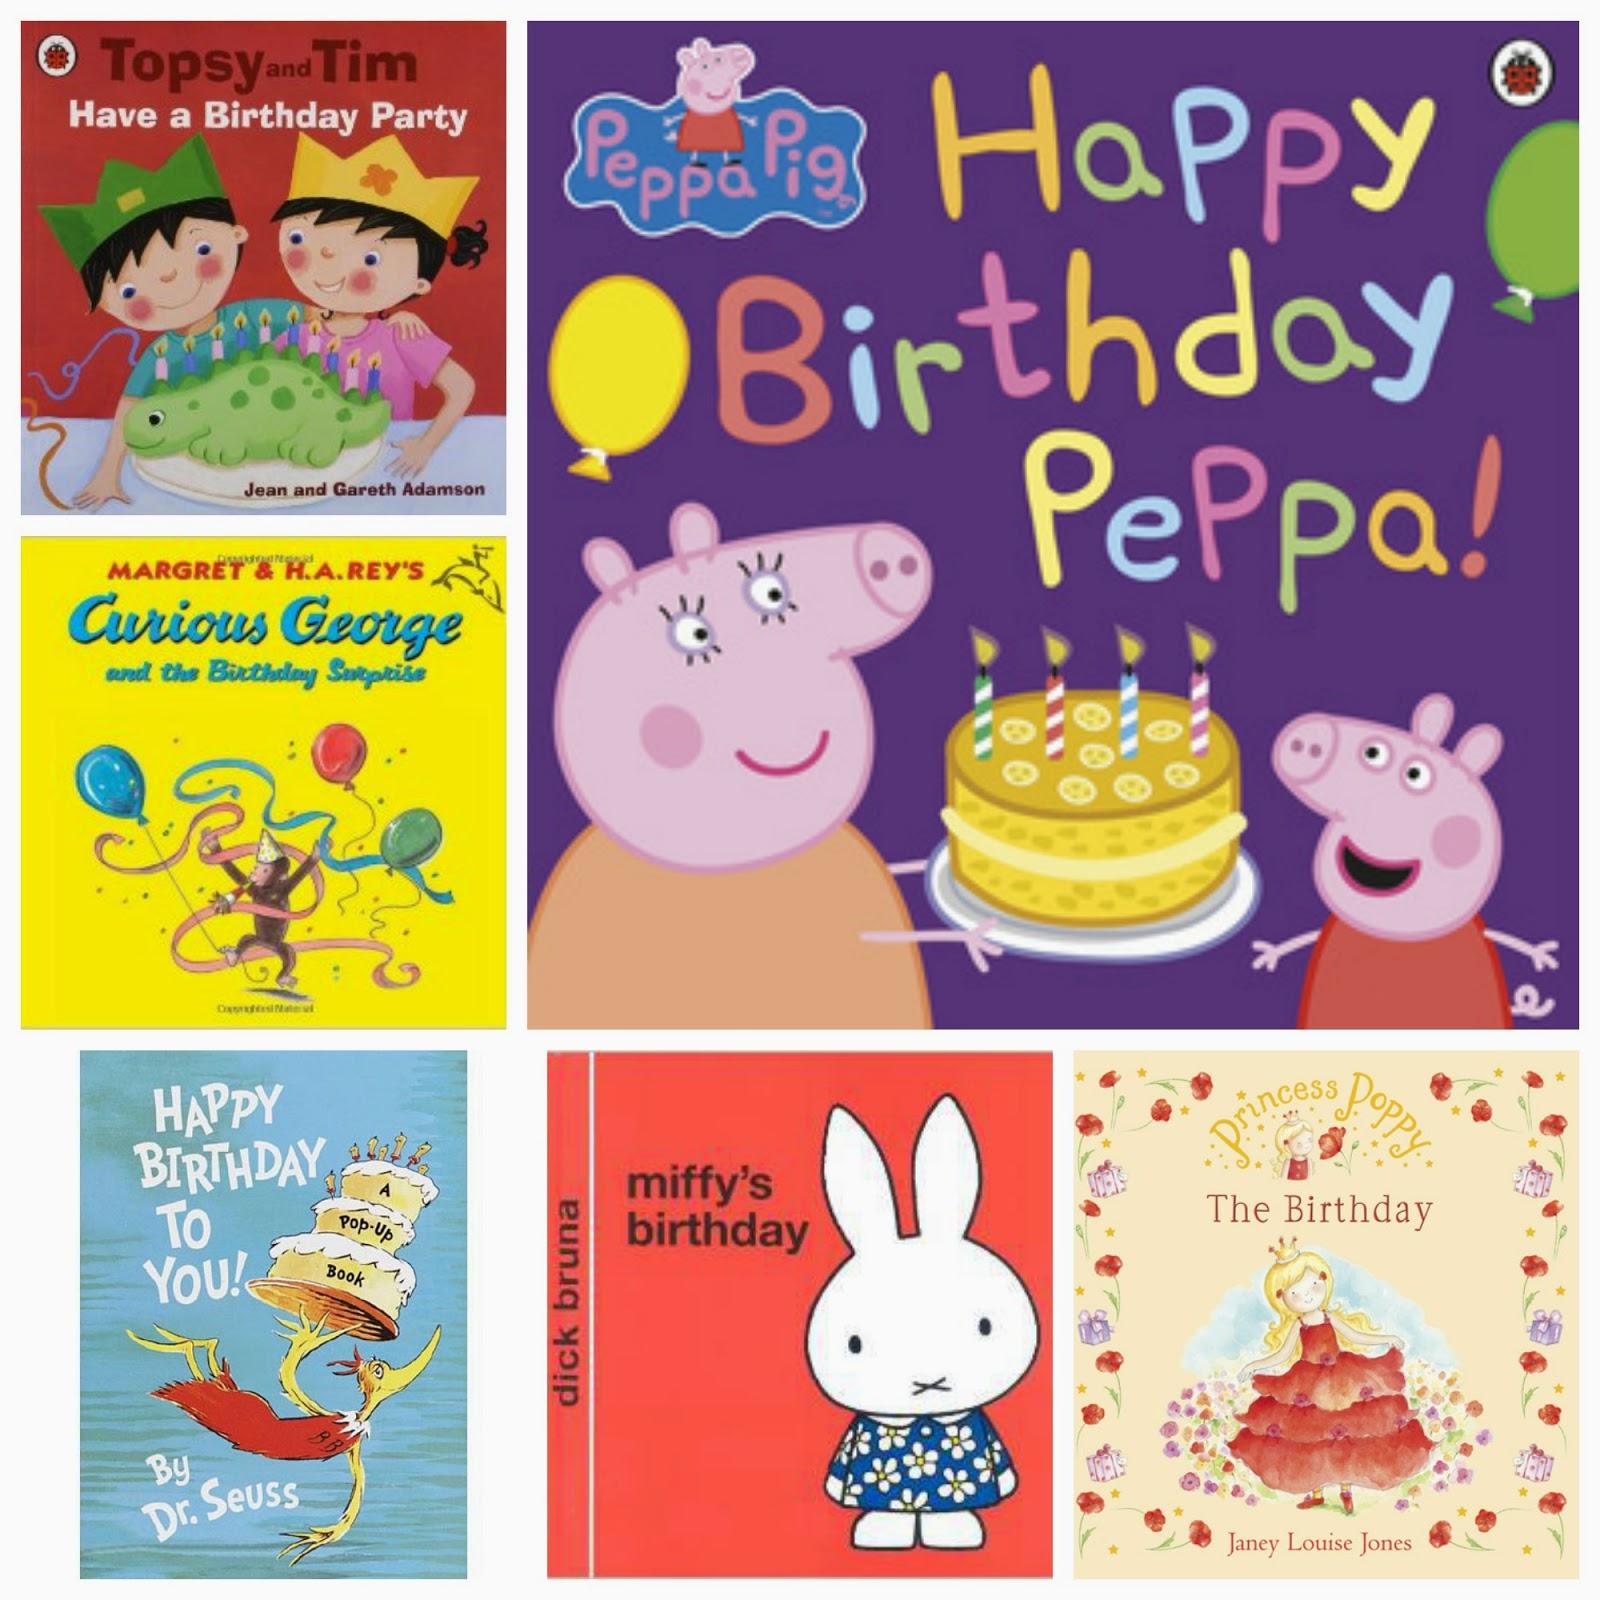 10 brilliant books for birthday boys and girls! | amazon | birthday books | happy birthday | ant and bee | peppa pig | koomins | belle and boo | birthday books | birthday stories | gift ideas | party books | kids books | sunday night book club | mamasVIB | maisy | miff | birthday | kids birthdays | boos for kids | gift ideas |